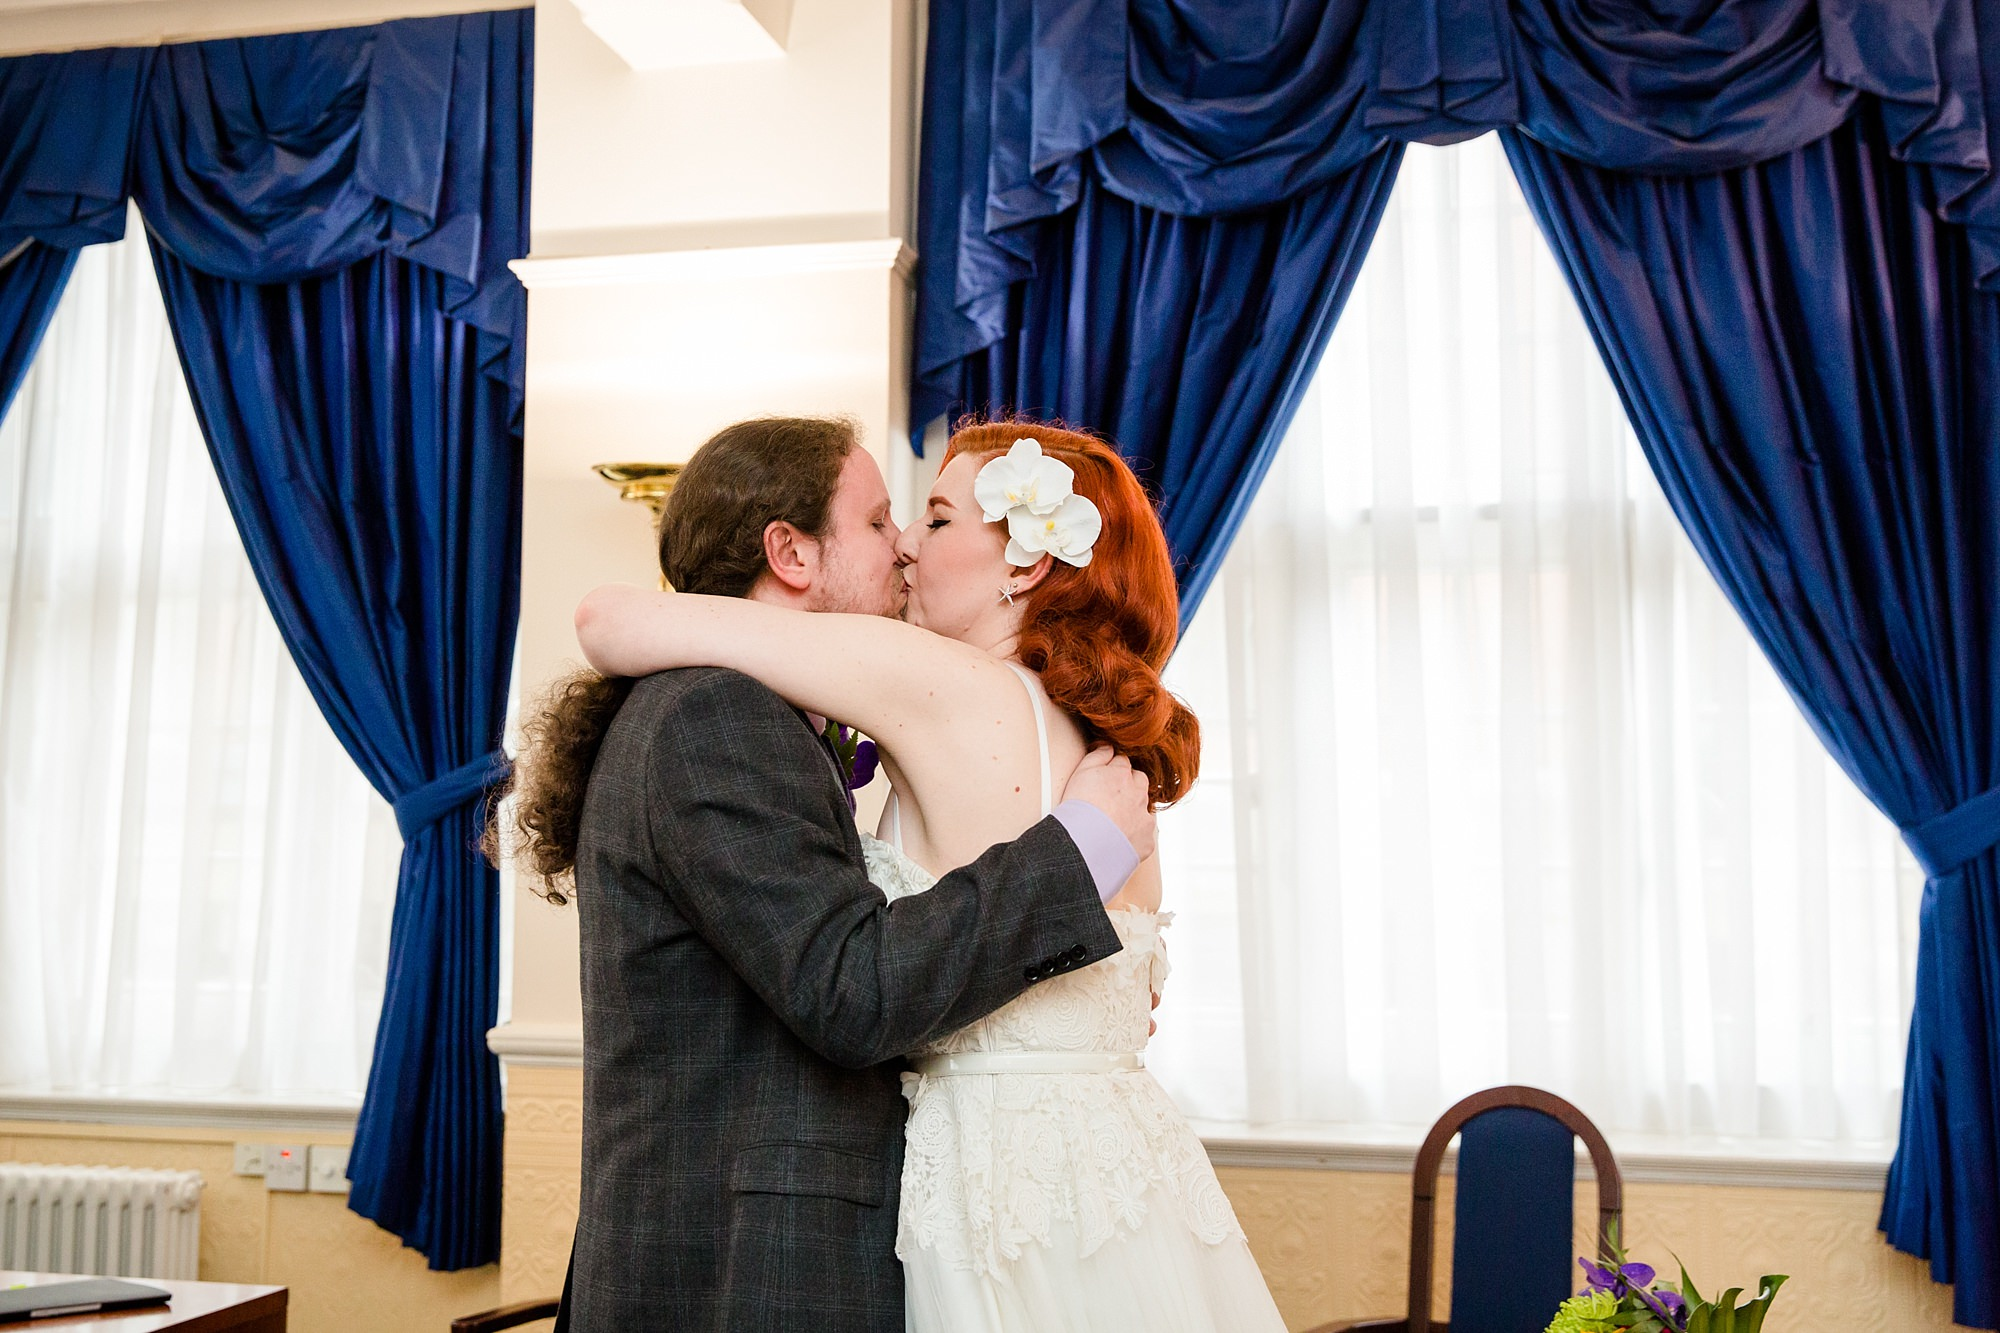 The Grange Ealing wedding bride and groom kiss